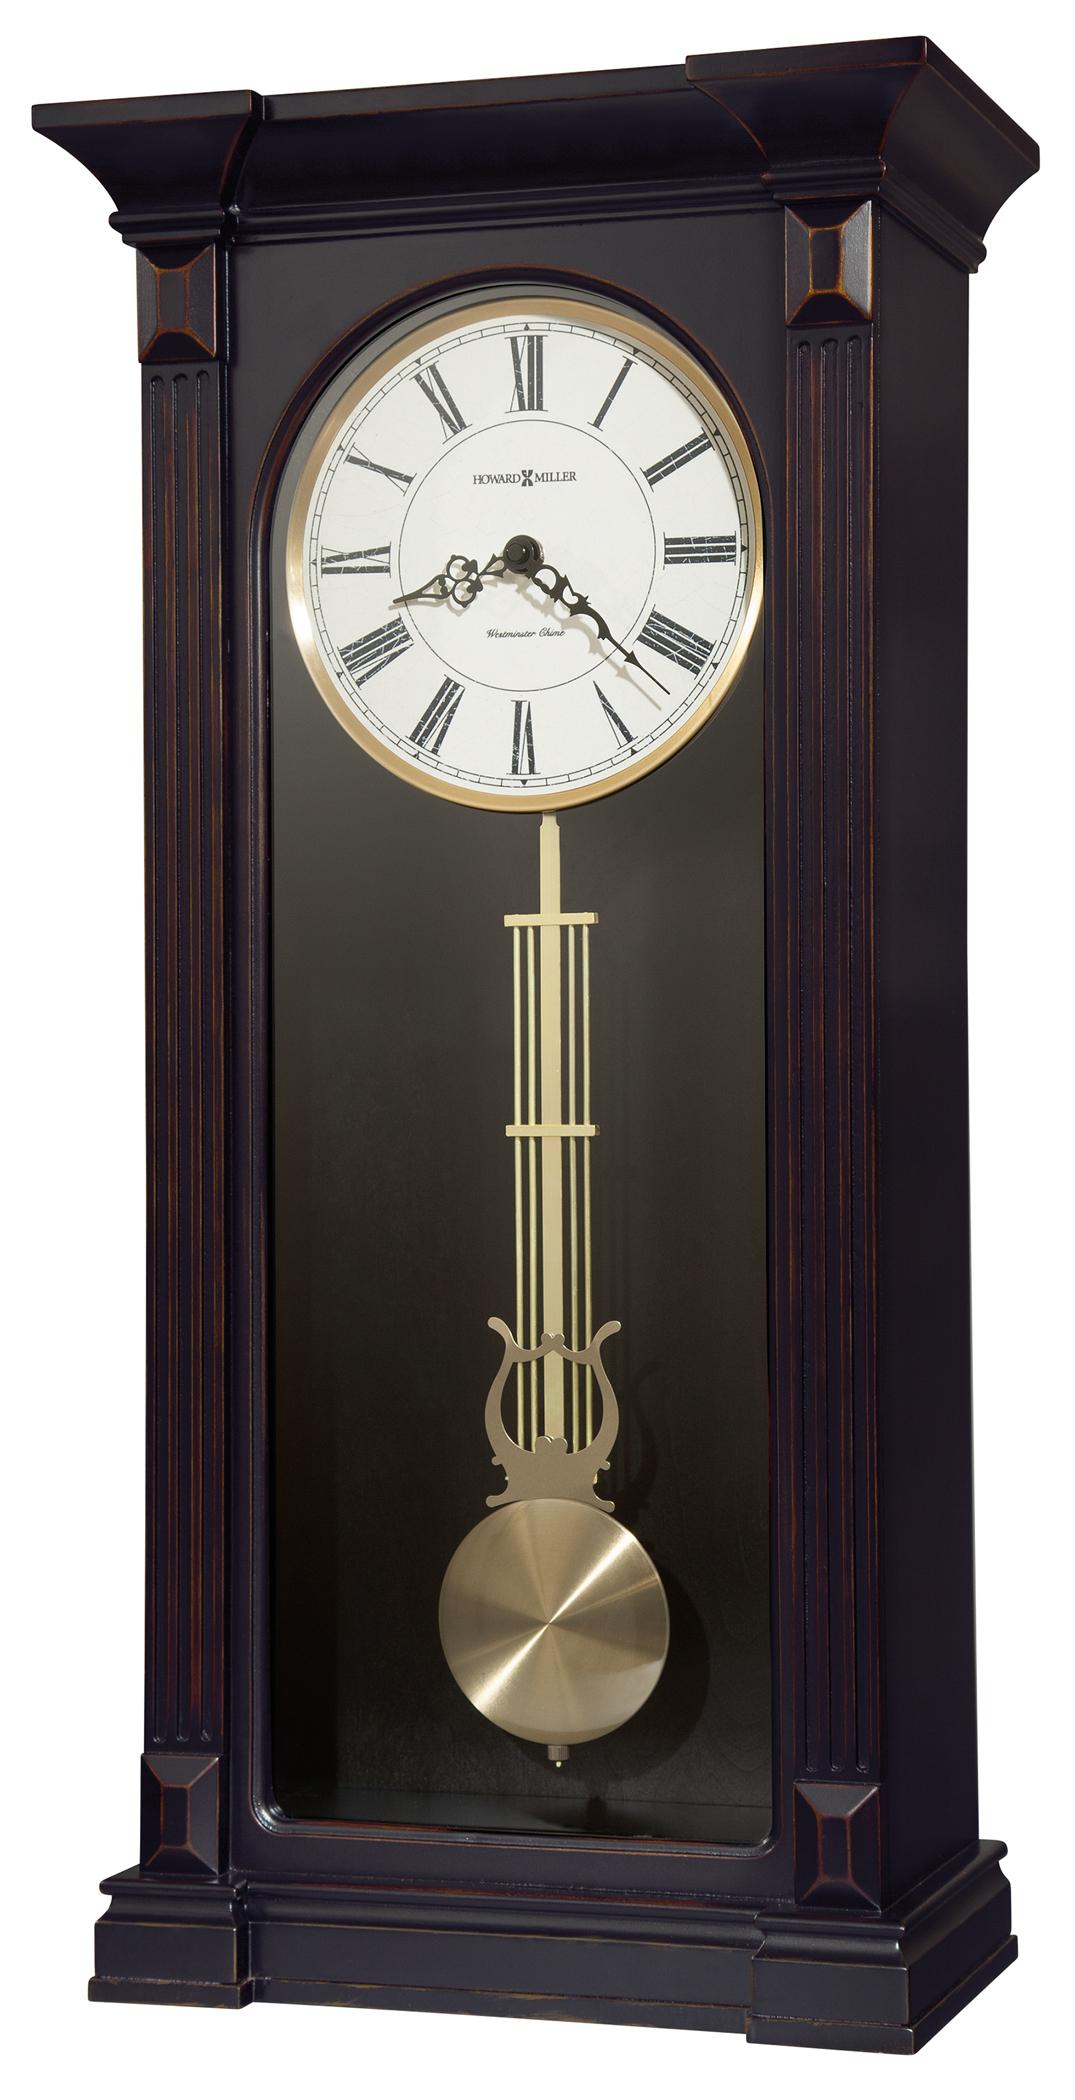 Mia Wall 625 603 Howard Miller Chiming Wall Clock